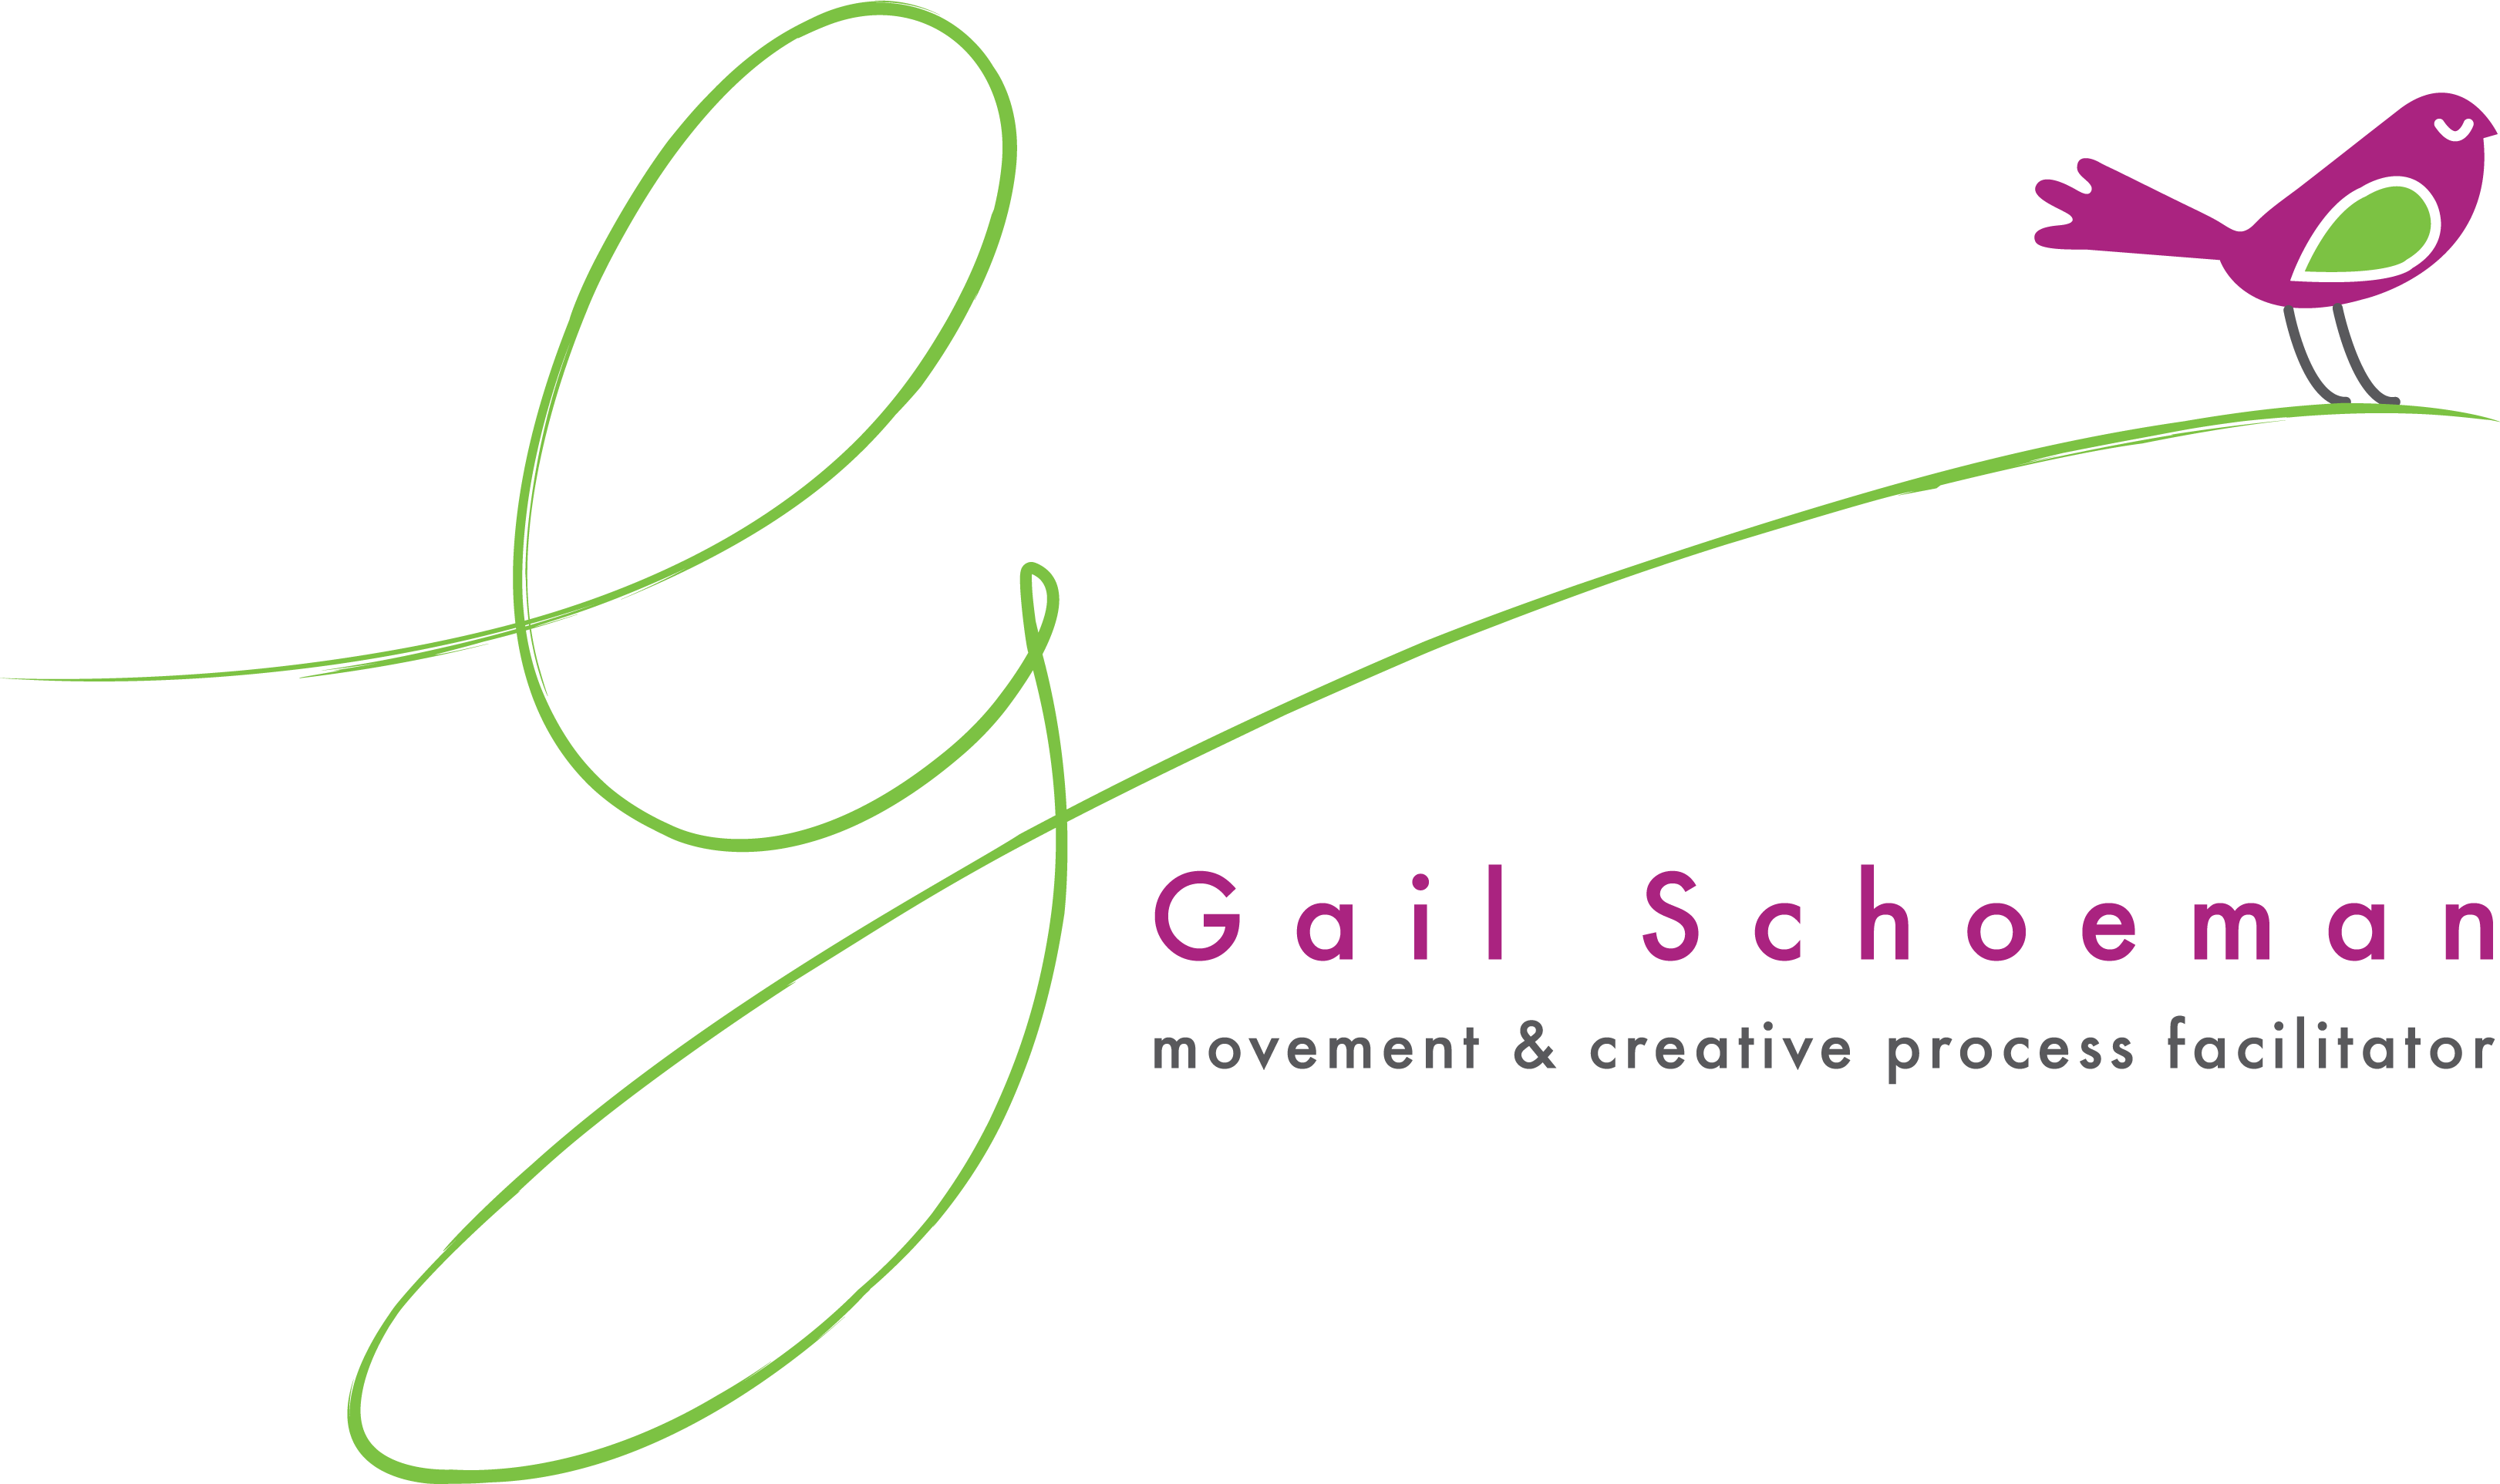 Gail Schoeman